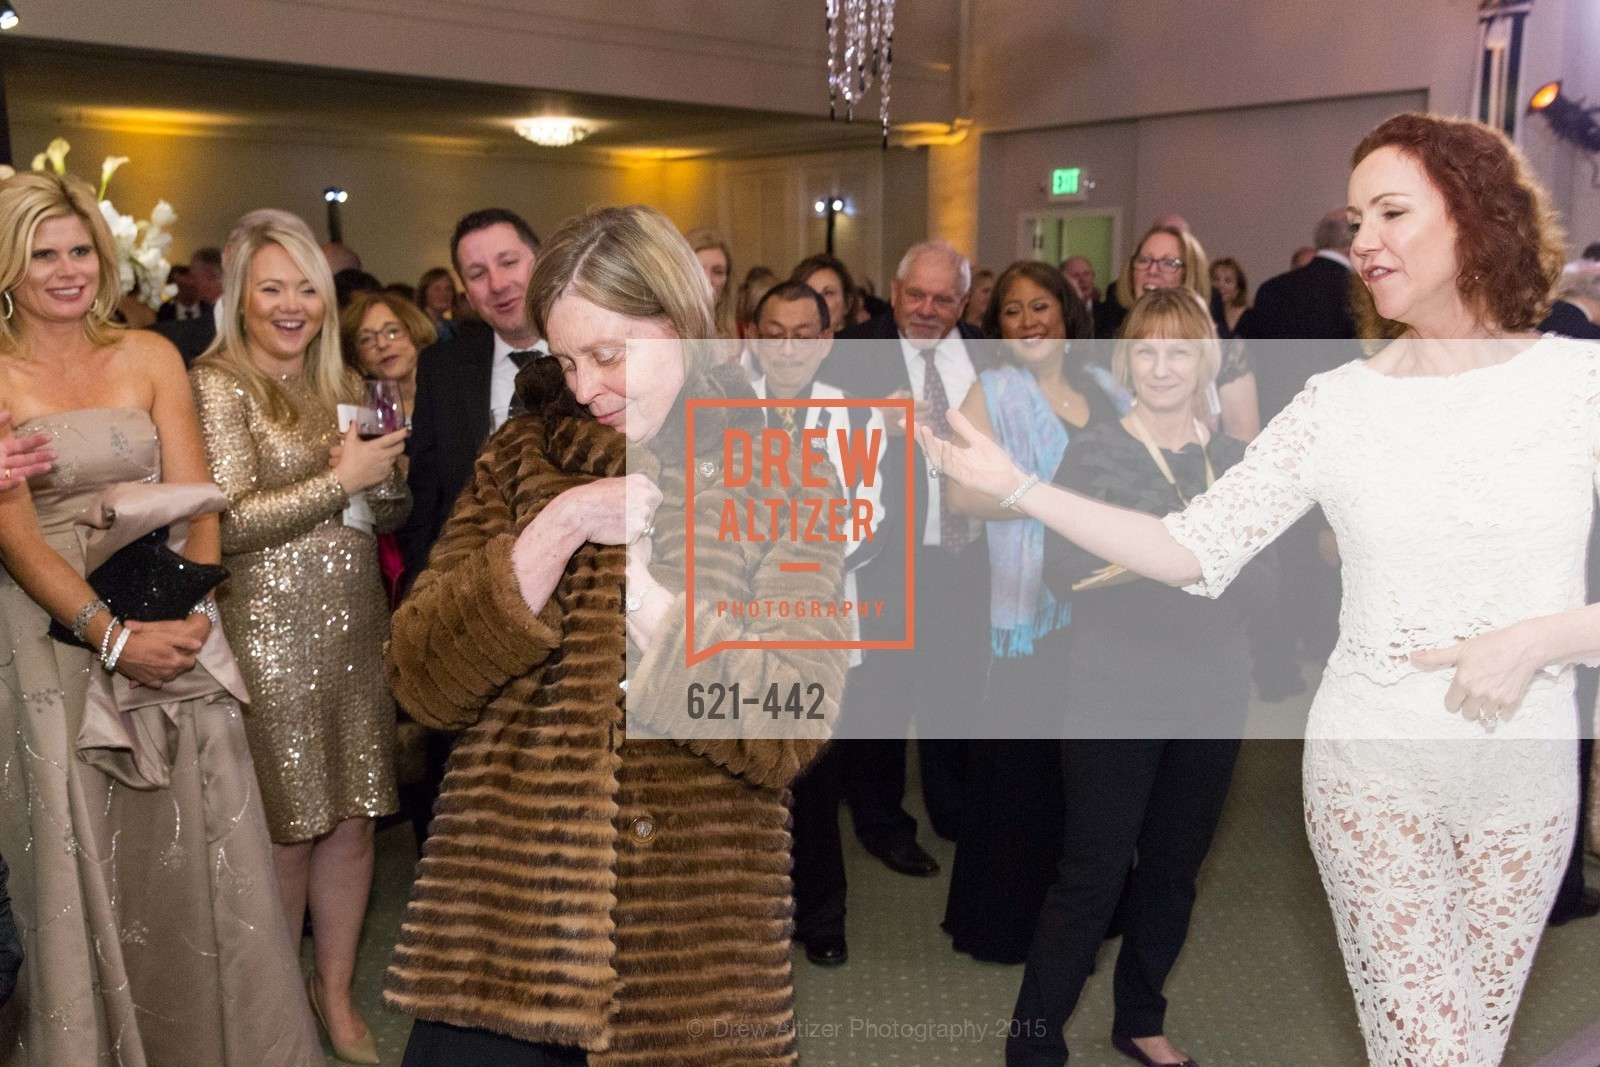 Suzanne Muntzing, Metropolitan Club Presents THE CENTENNIAL GALA, Metropolitan Club. 640 Sutter Street, November 5th, 2015,Drew Altizer, Drew Altizer Photography, full-service agency, private events, San Francisco photographer, photographer california